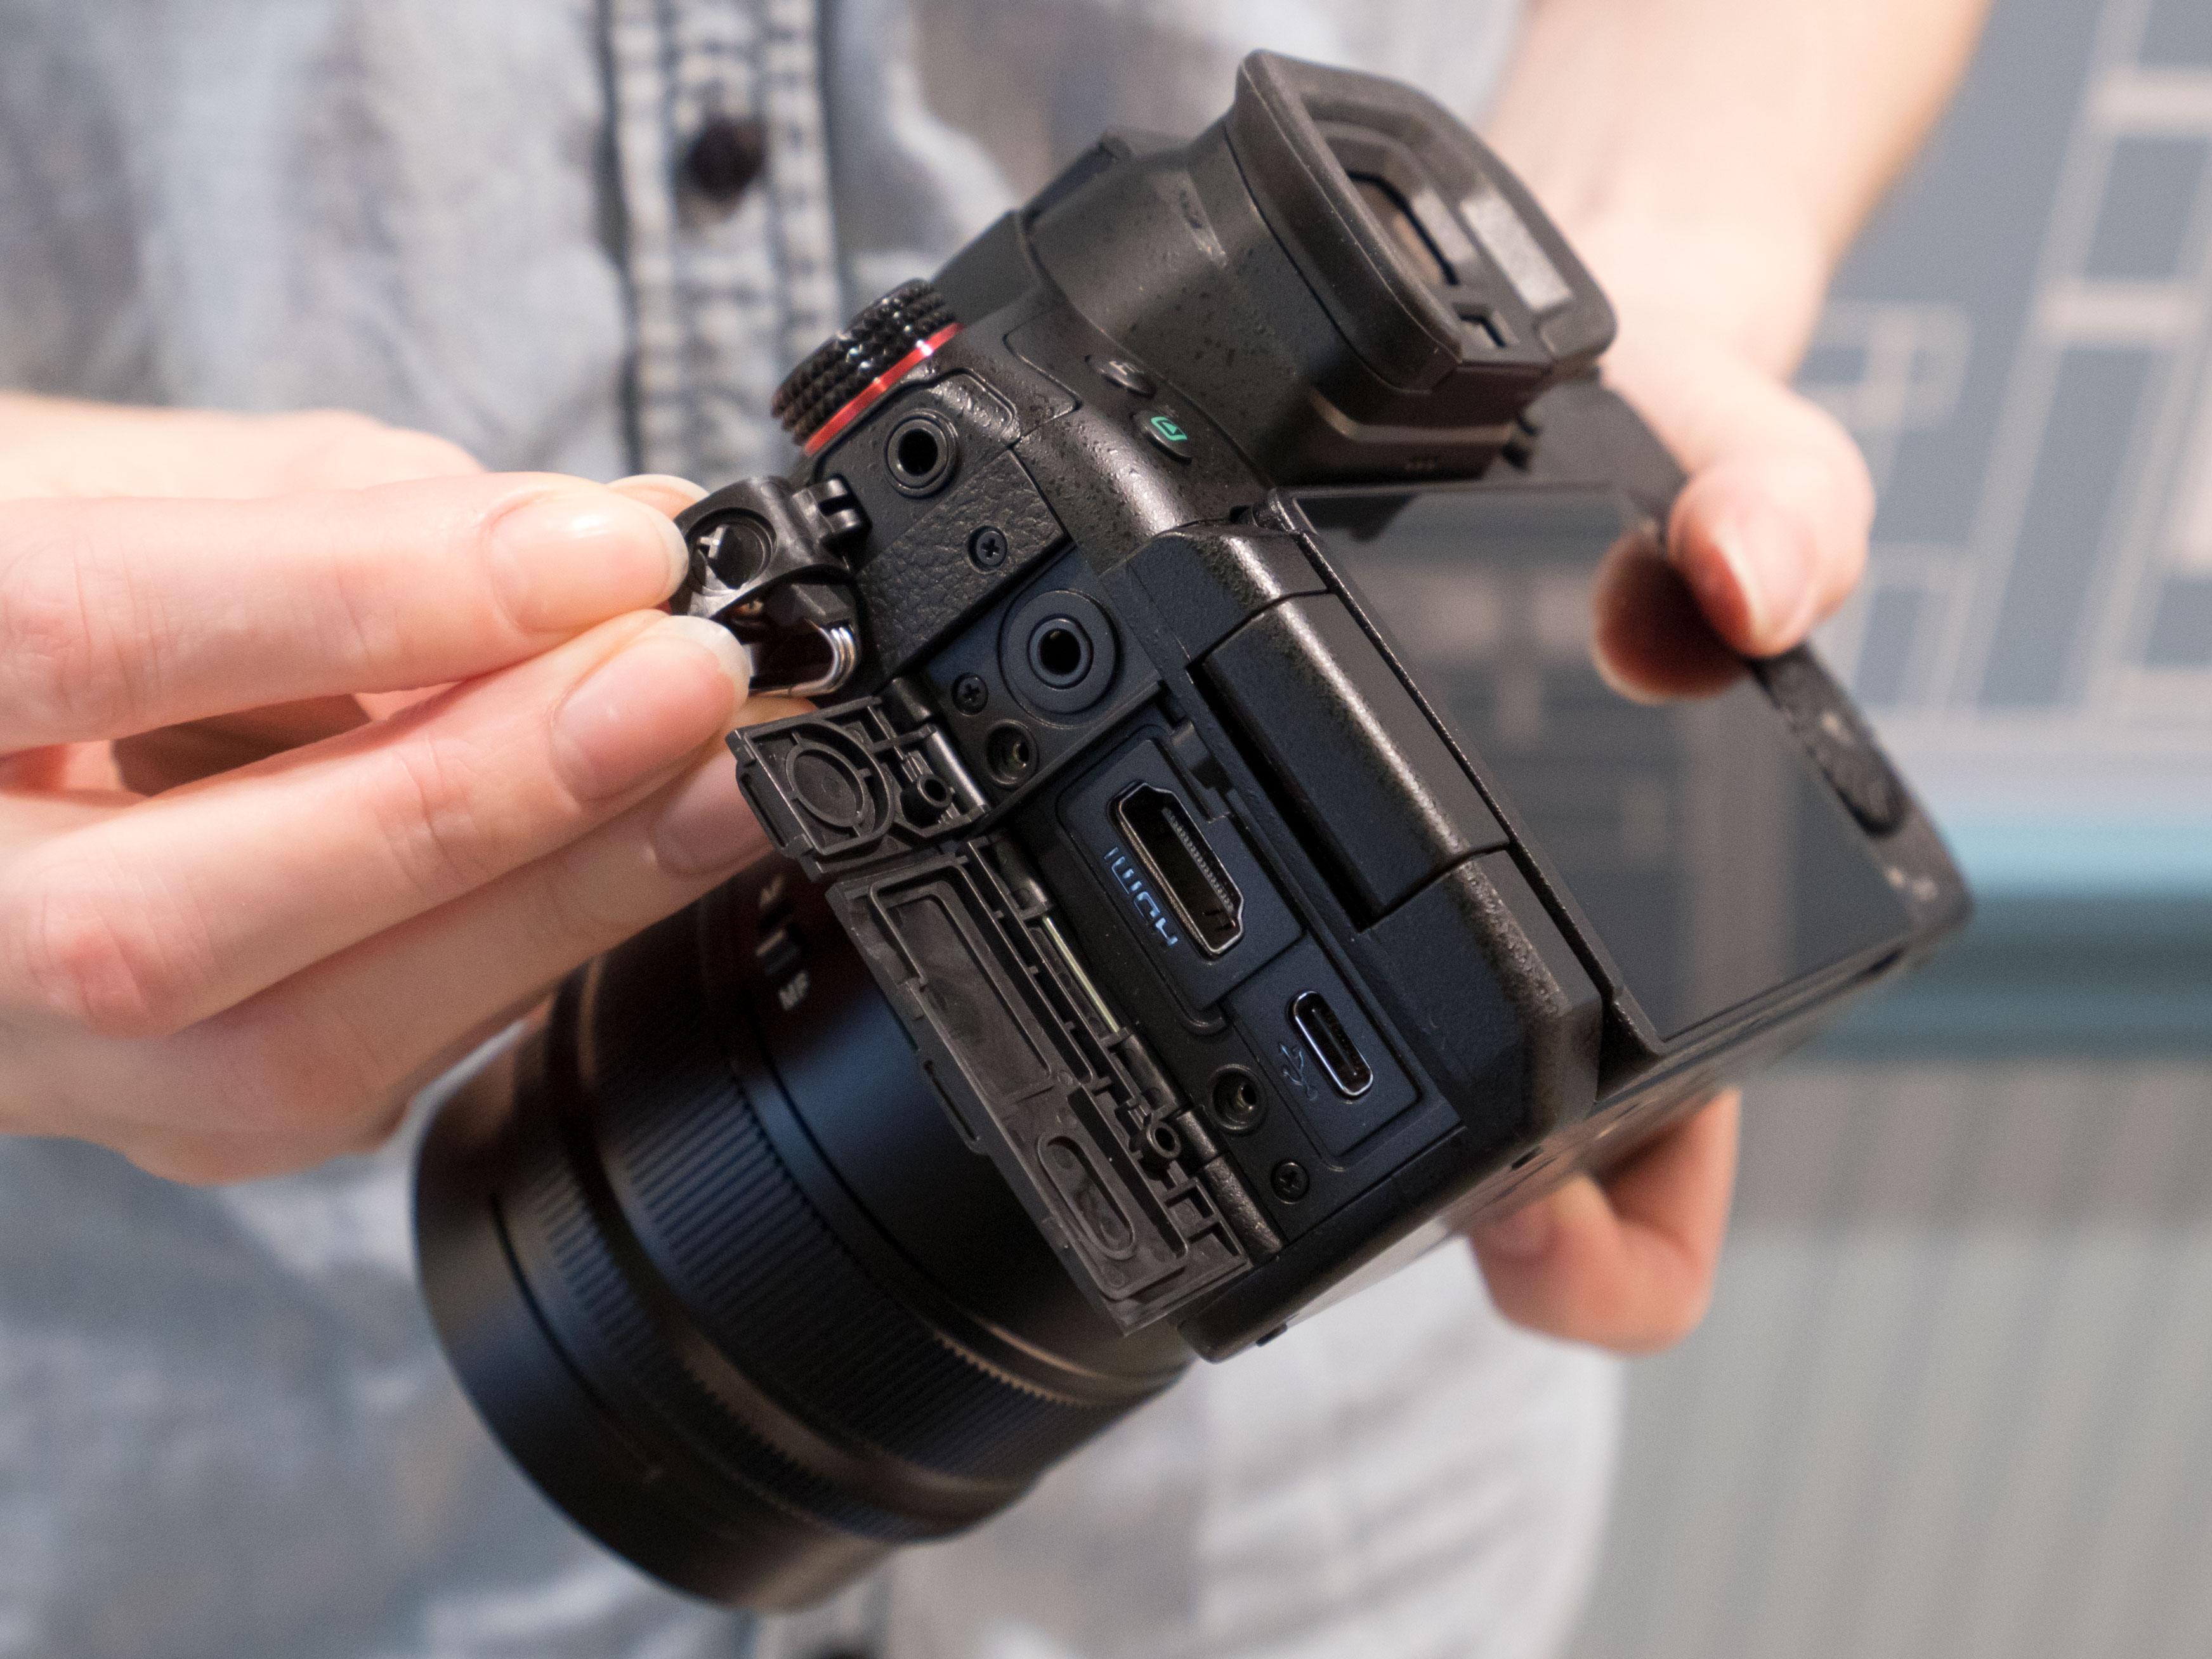 Panasonic Lumix GH5S vs GH5: What's new? – My Digital Photography